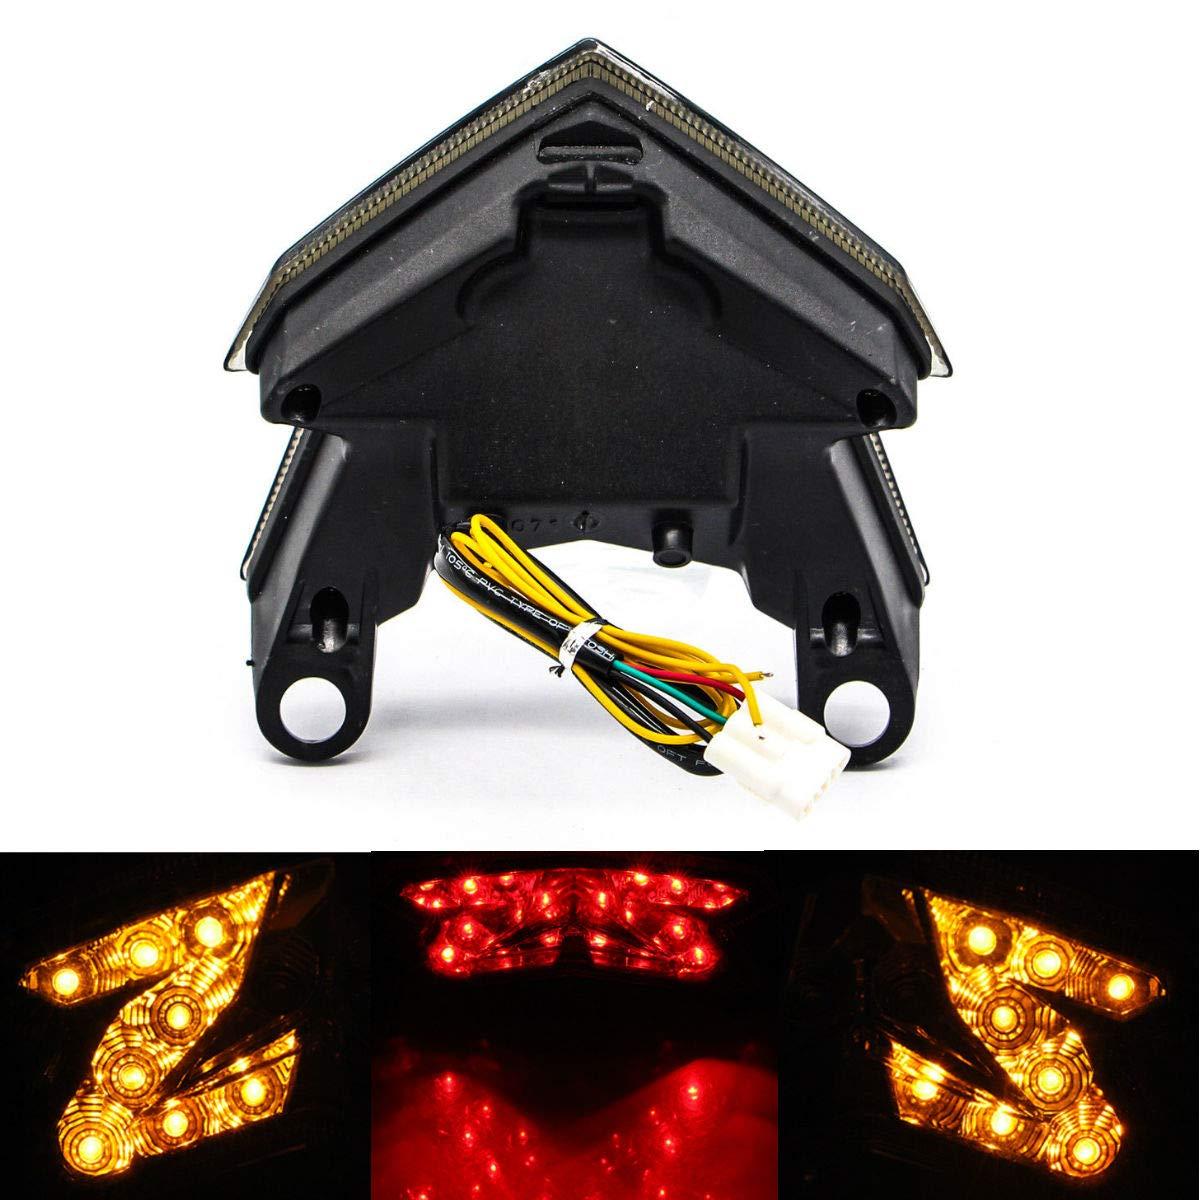 MZS Tail Light LED Turn Signal Blinker Integrated compatible Kawasaki Ninja ZX6R ZX-6R 2013-2018// Z125 2016-2017// Z125 Pro 2017-2018// Z800 2013-2017 Smoke